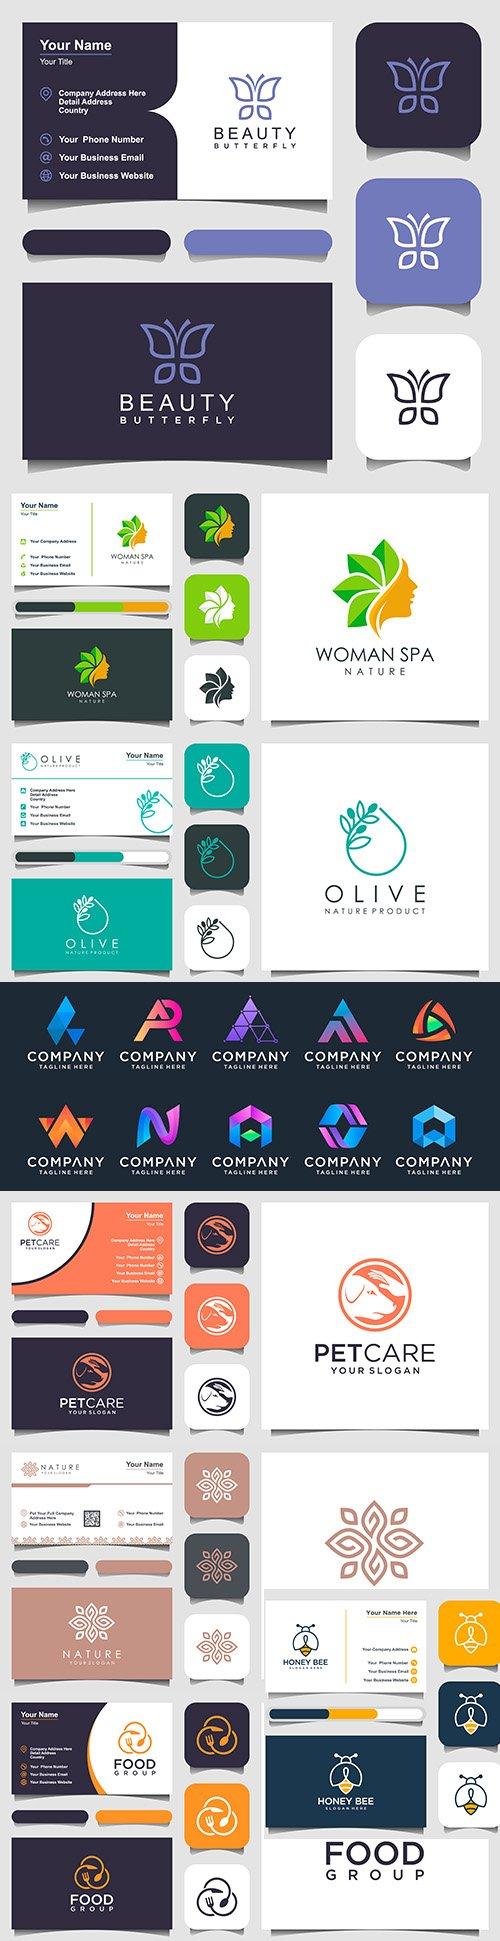 Minimalist elegant logo and business card design 5